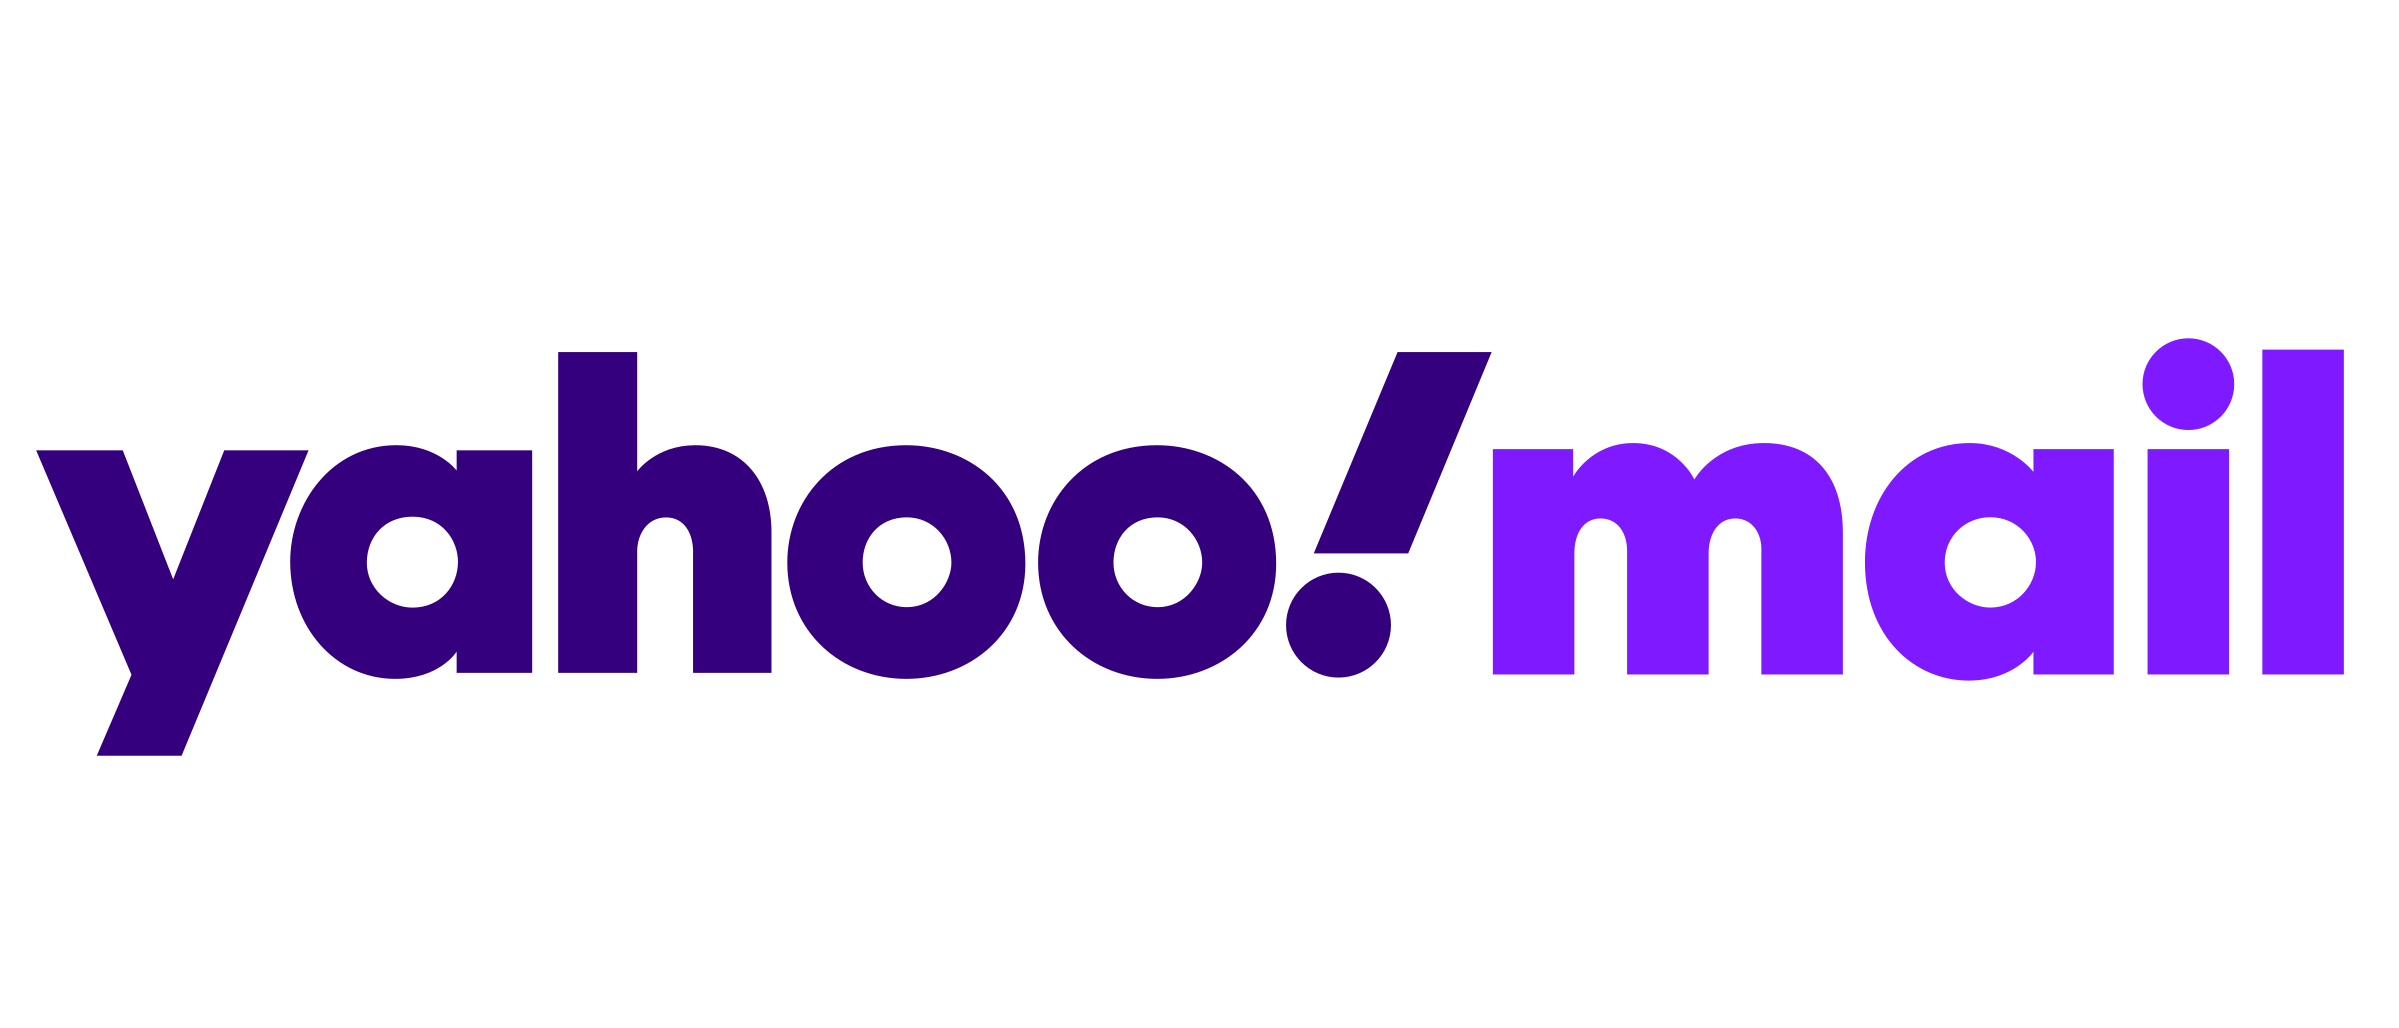 Ir a Yahoo Mail